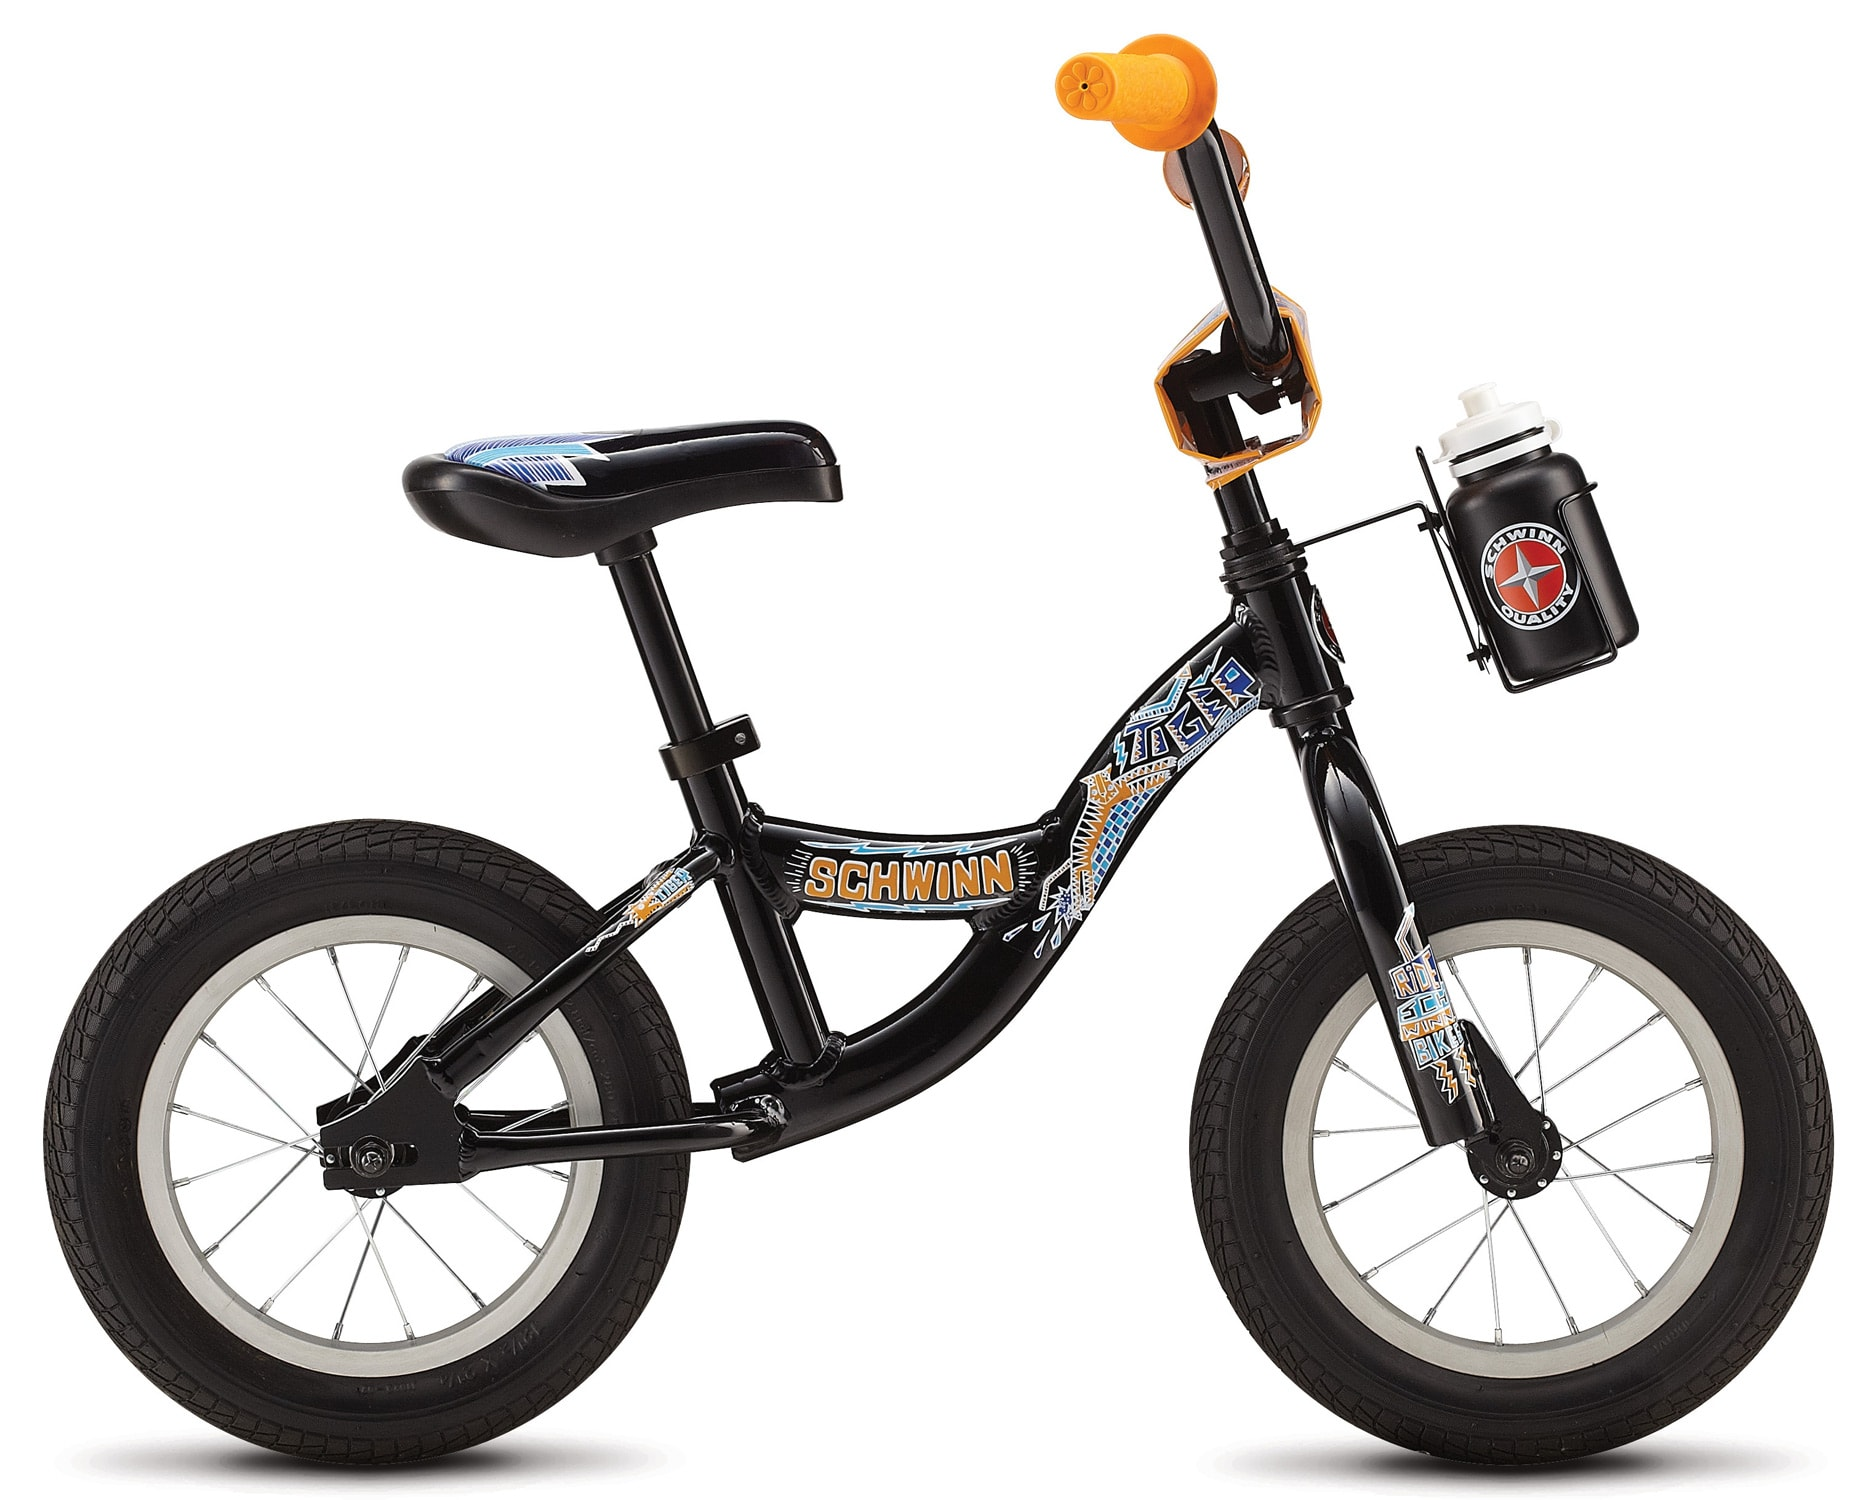 cdf191e3838 Schwinn Tiger WNR Bike - thumbnail 1